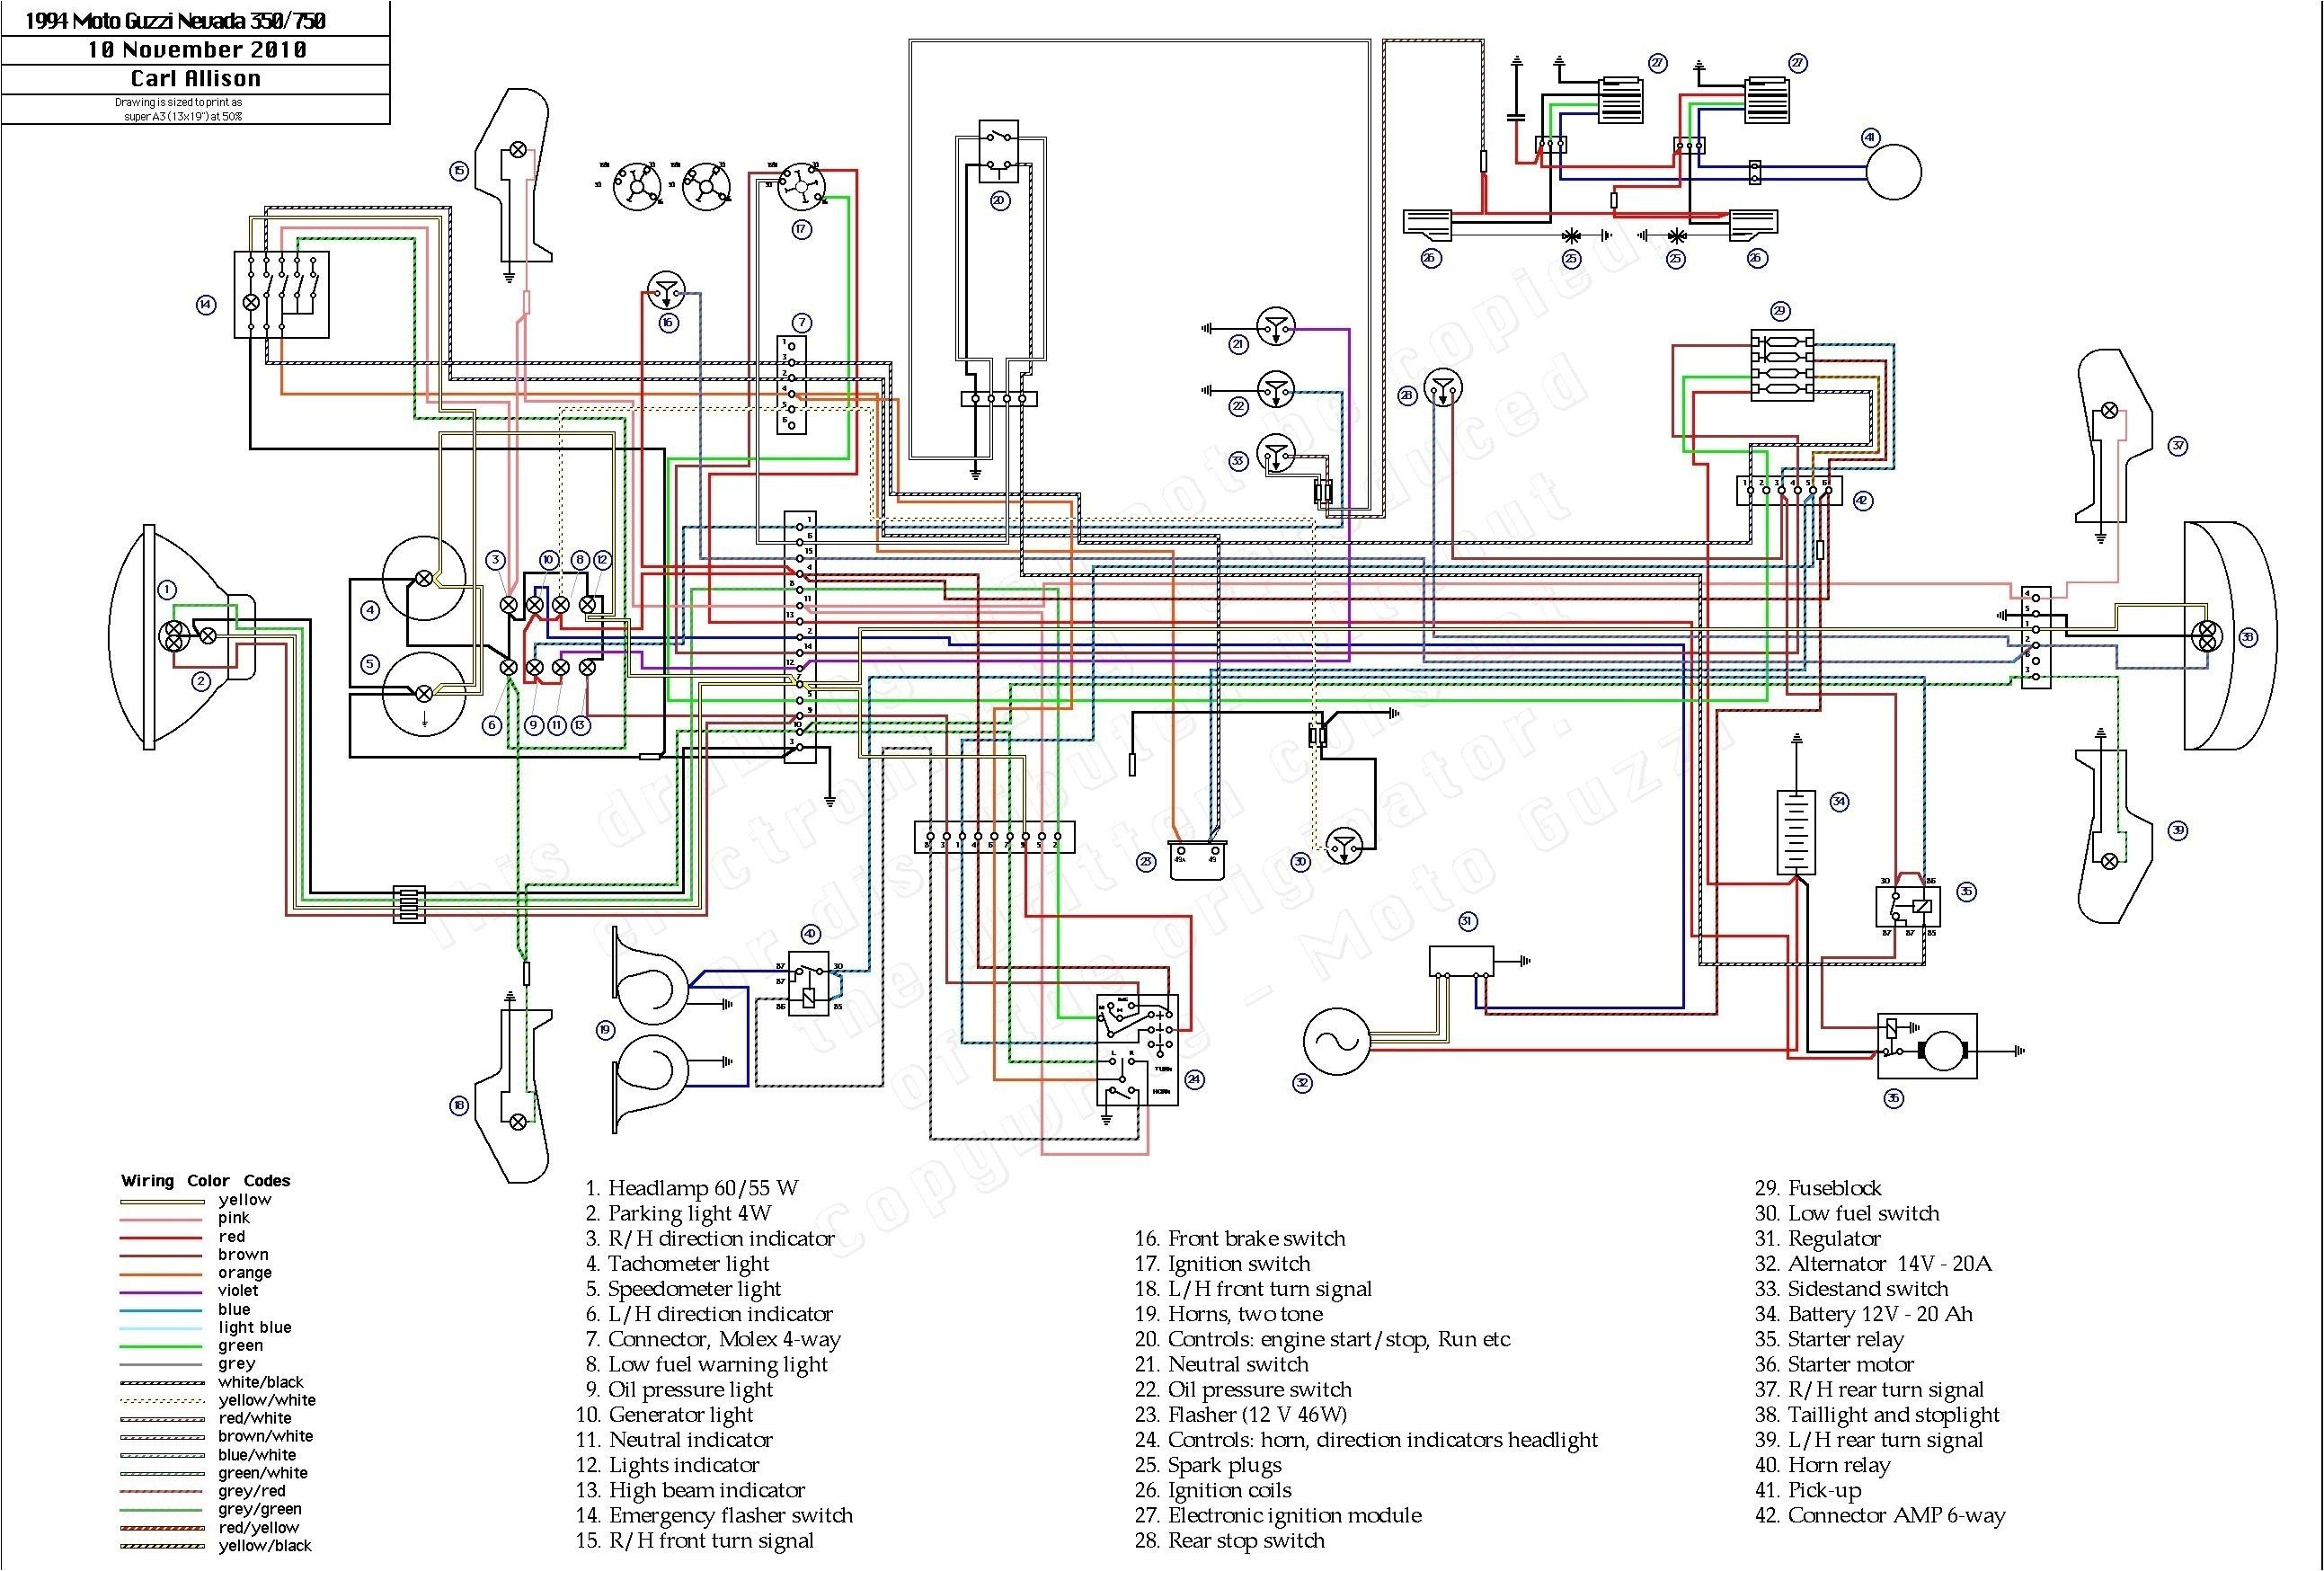 bmw wiring diagram system wiring diagram list bmw wiring diagram system v12 3 wiring diagrams bmw